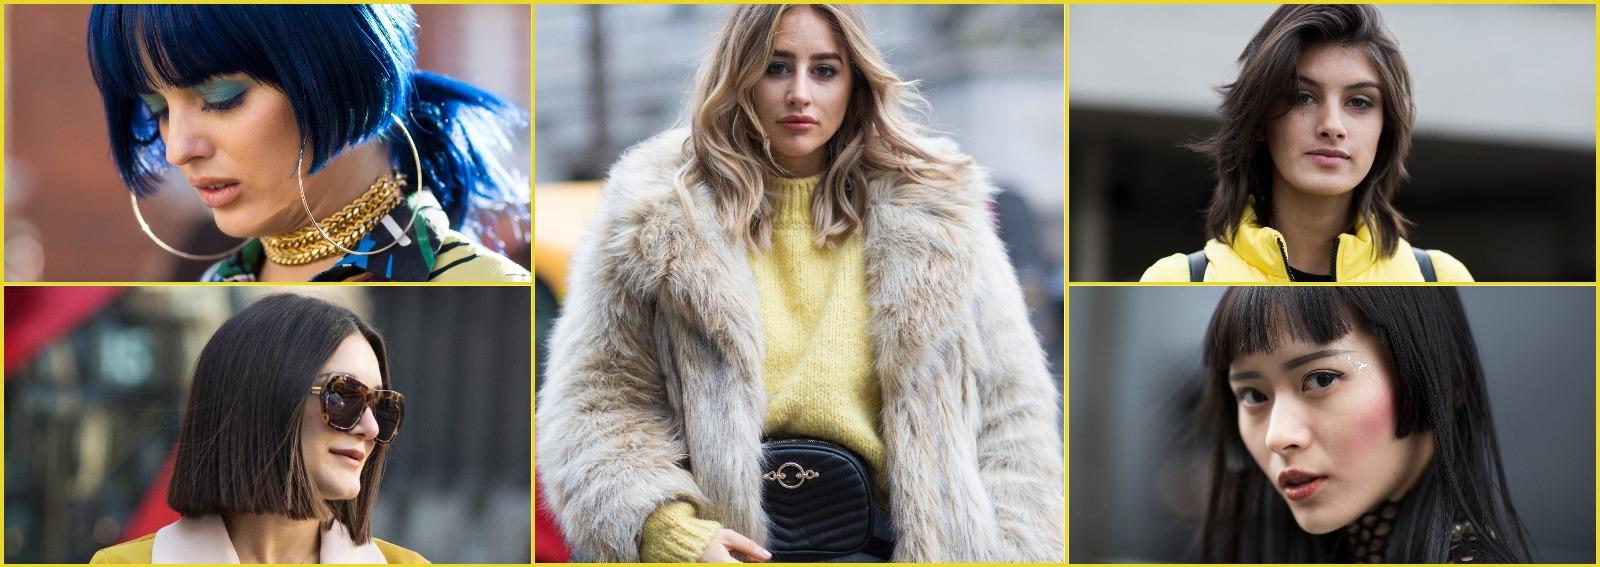 tagli-capelli-e-acconciature-piu-belli-london-fashion-week-2018-cover-desktop